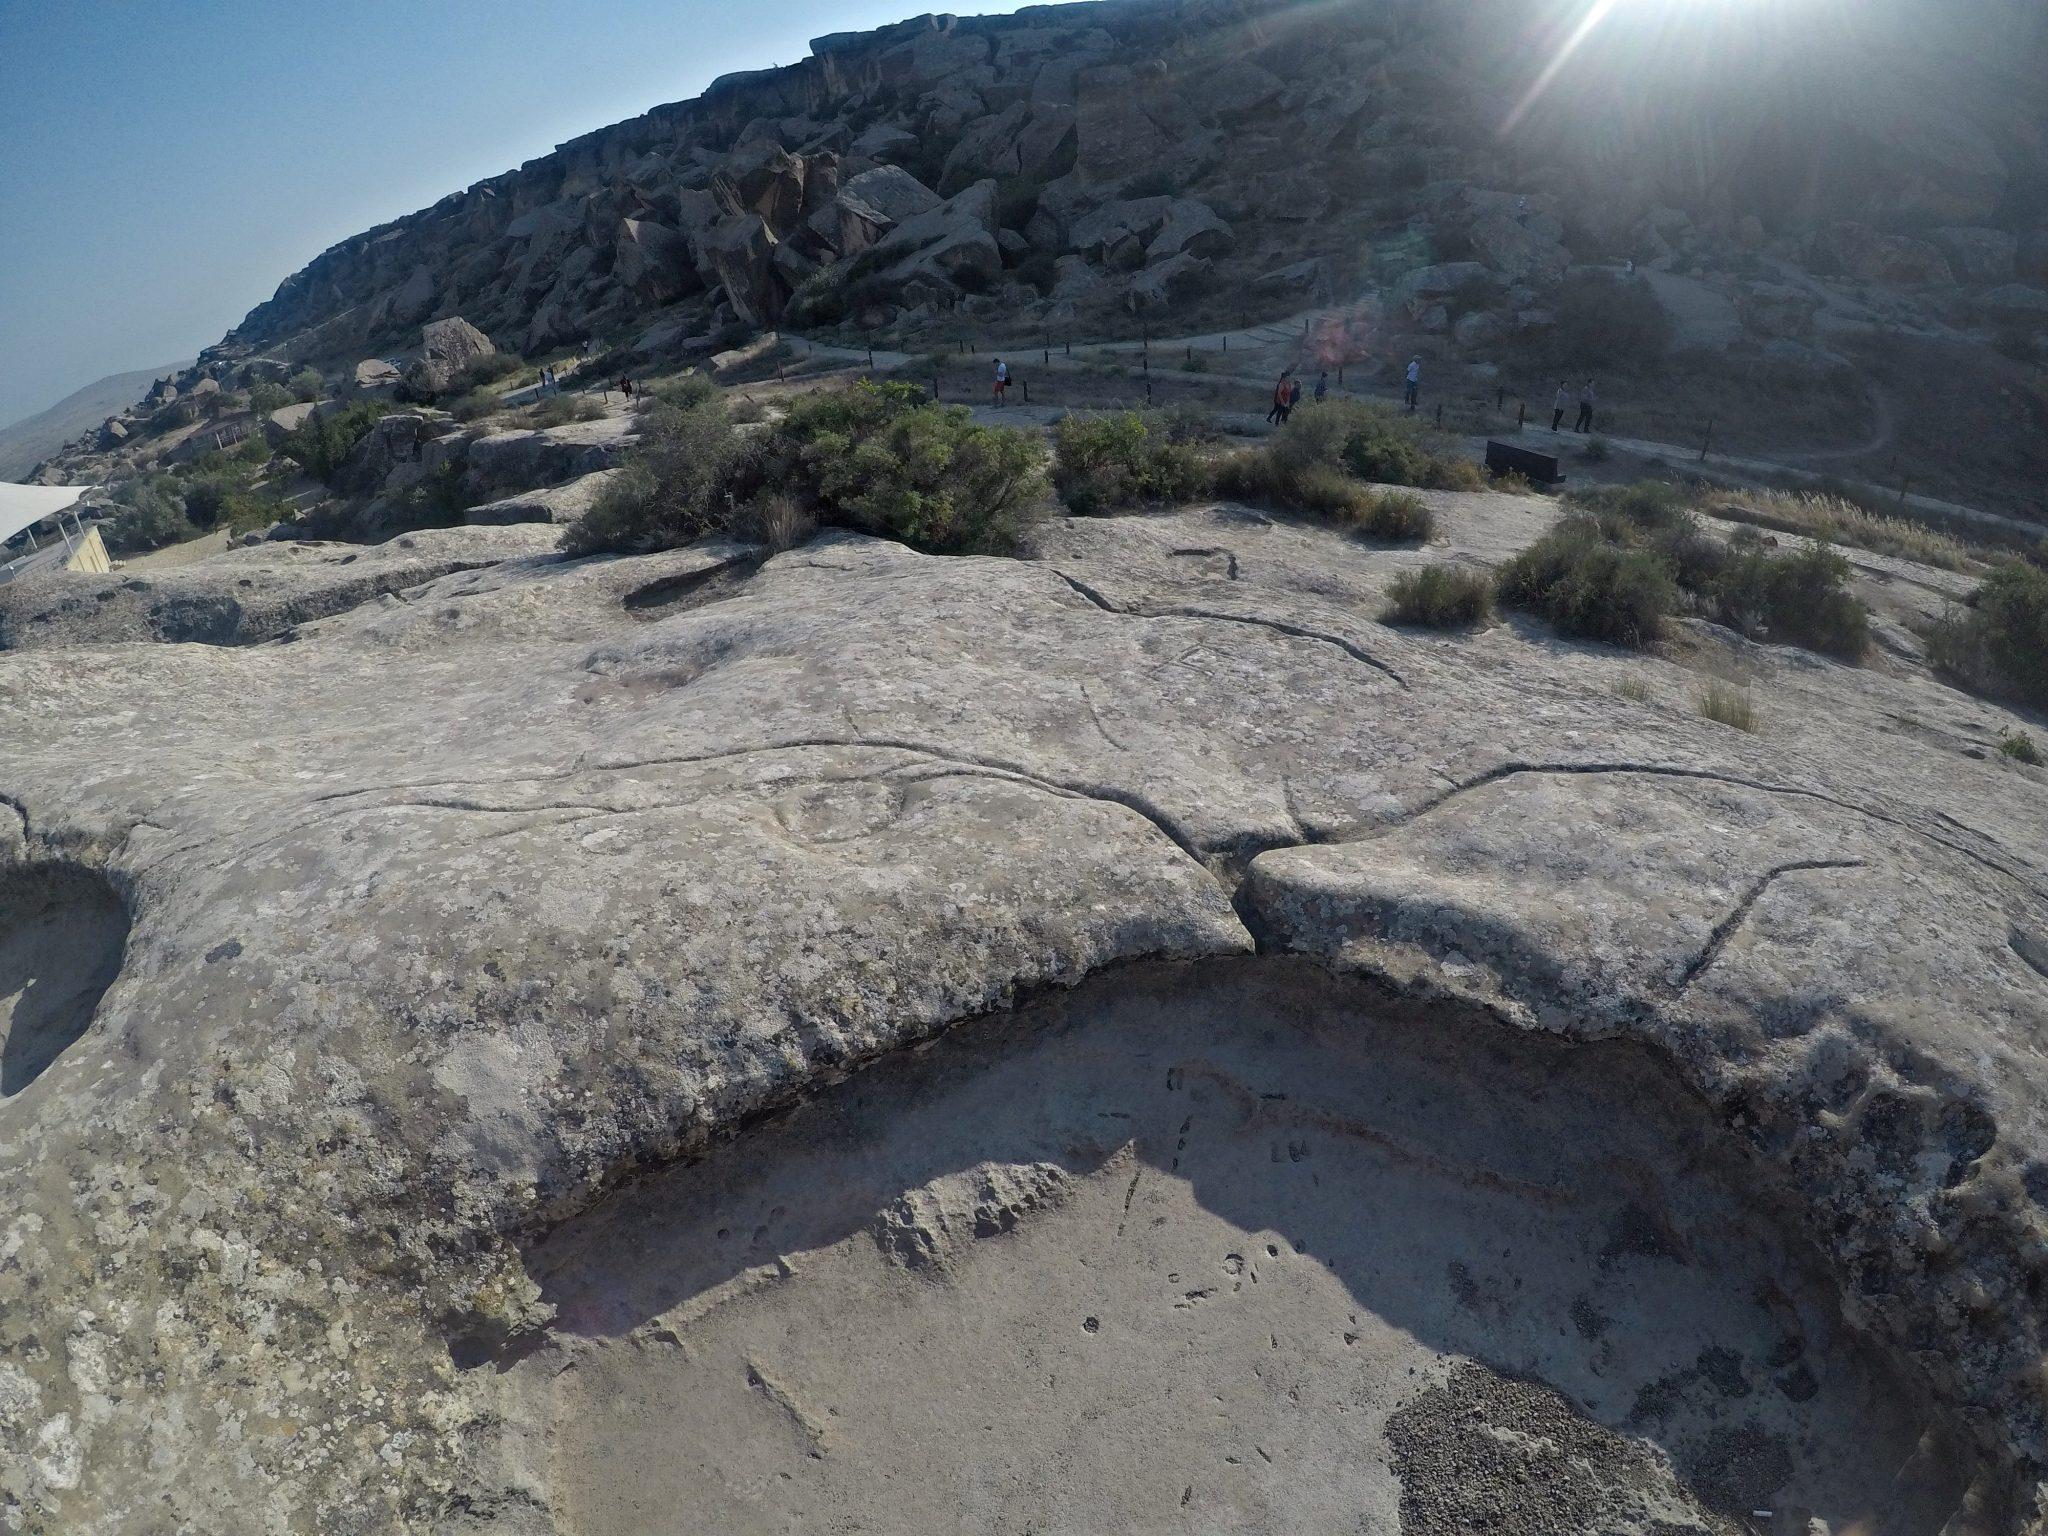 Neaktivan blatni vulkan azerbajdžan travelina